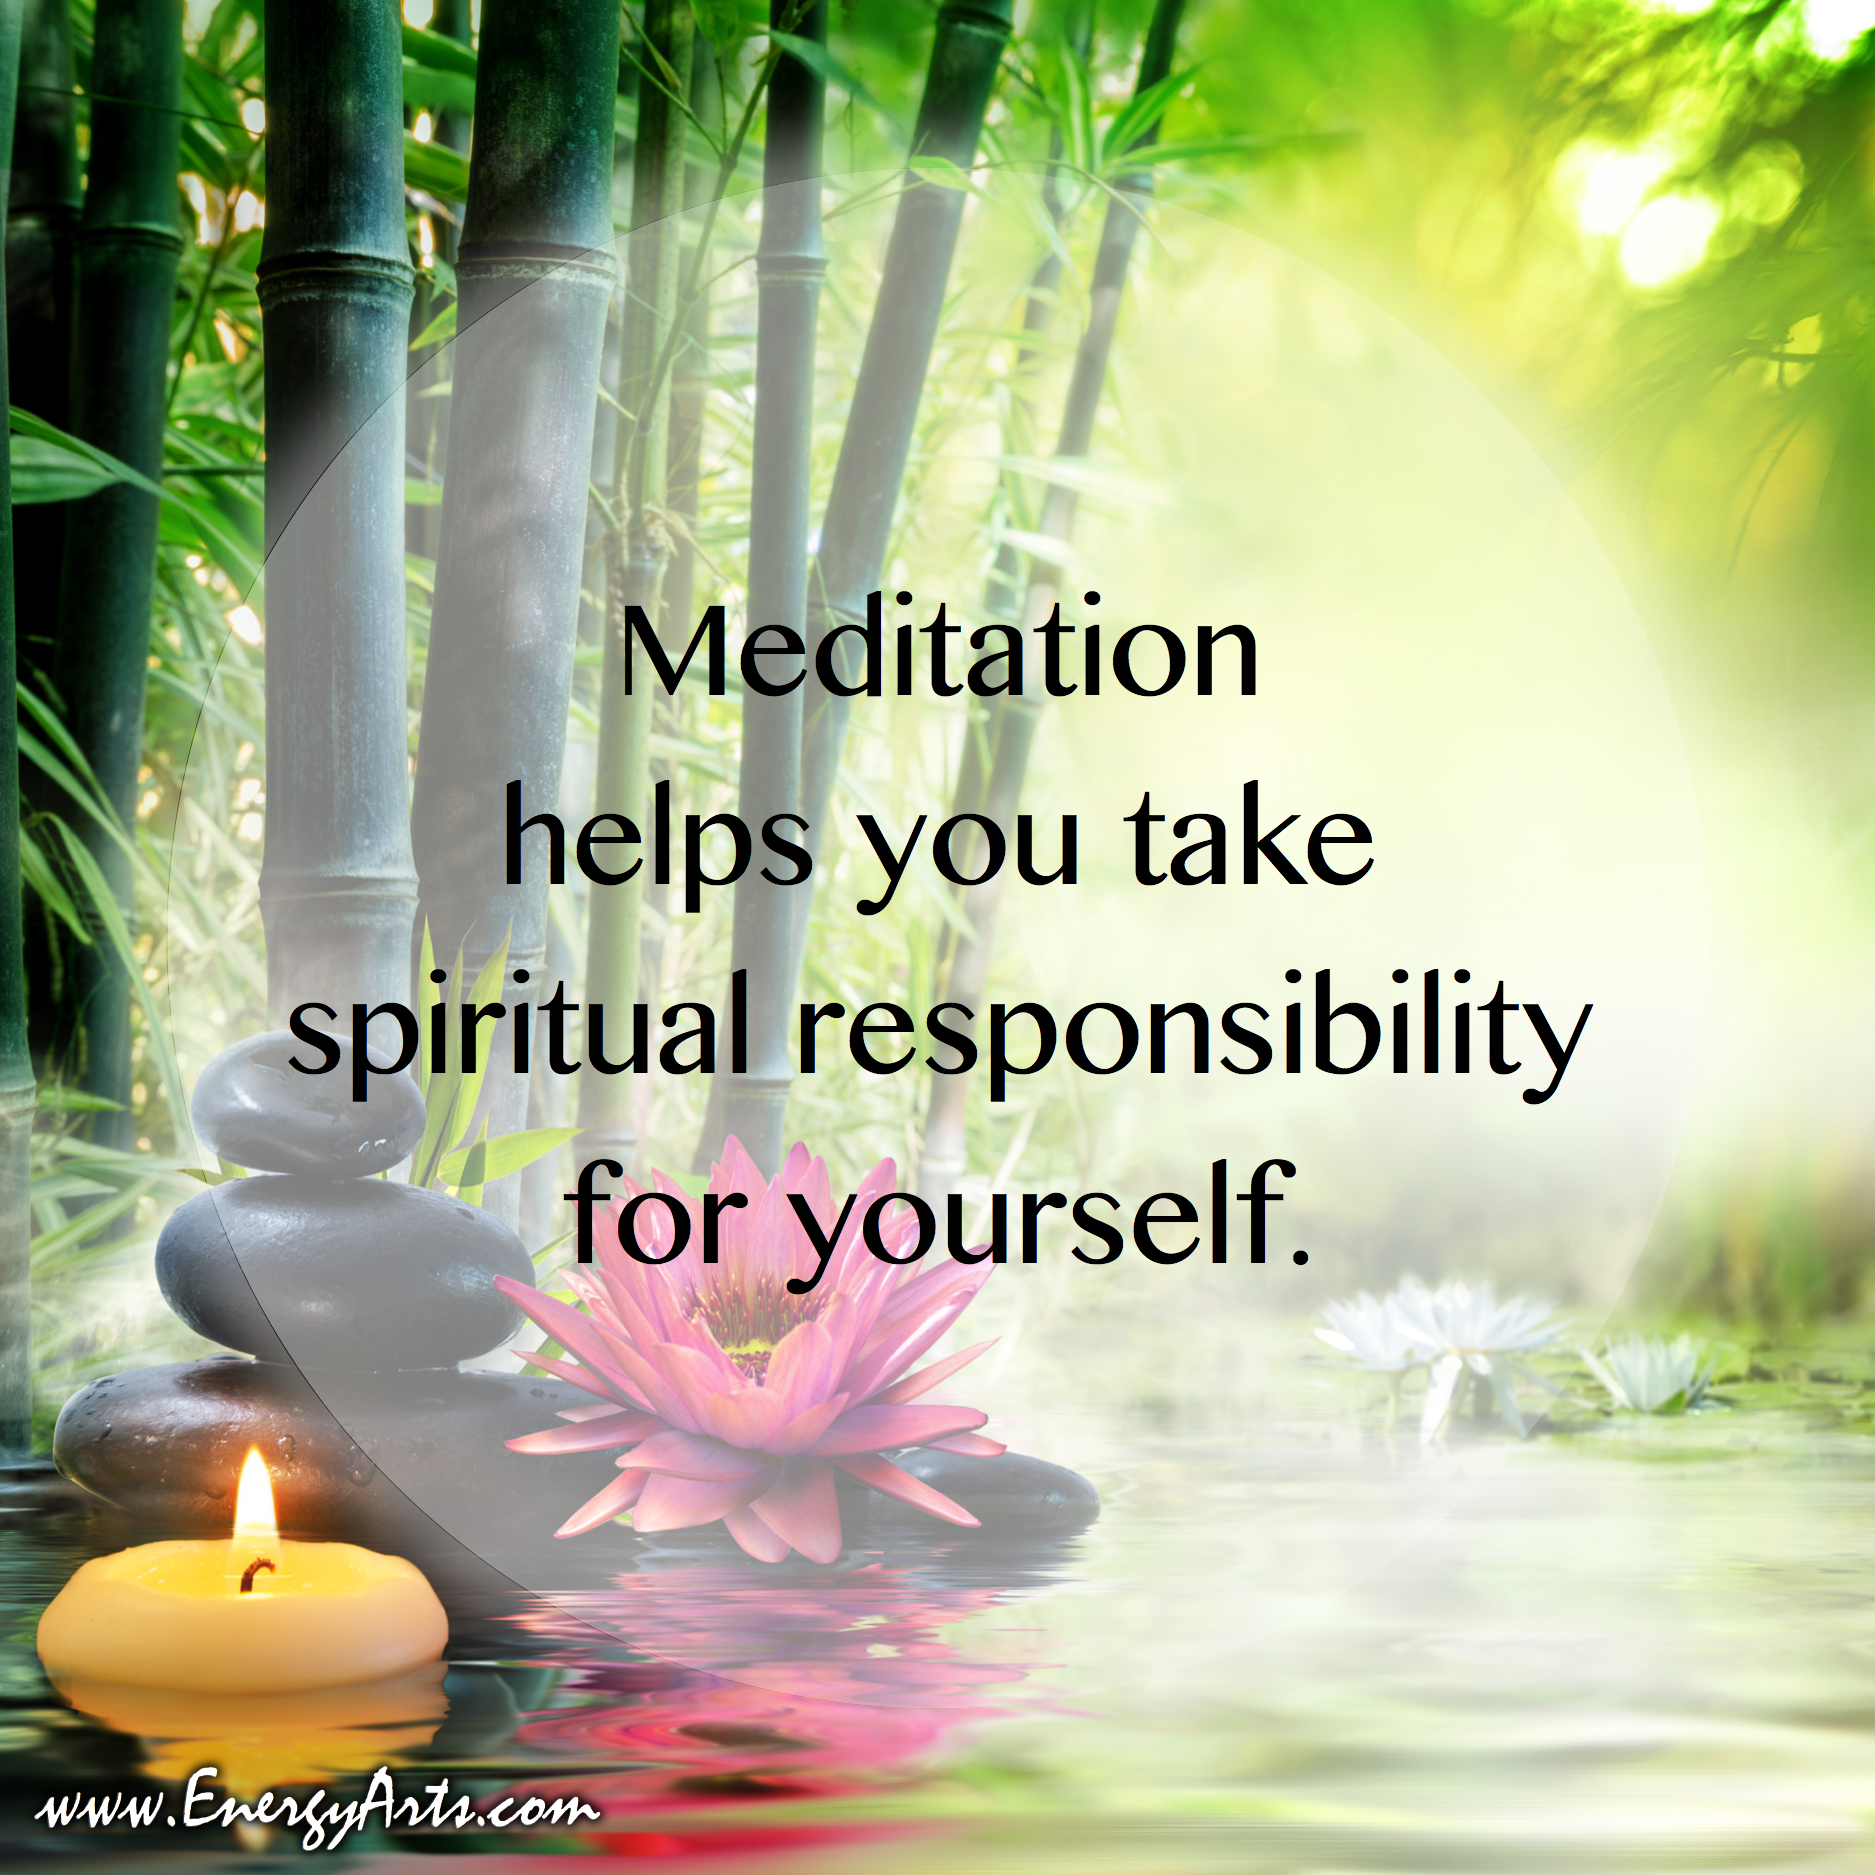 In the Taoist meditation tradition, spirituality involves